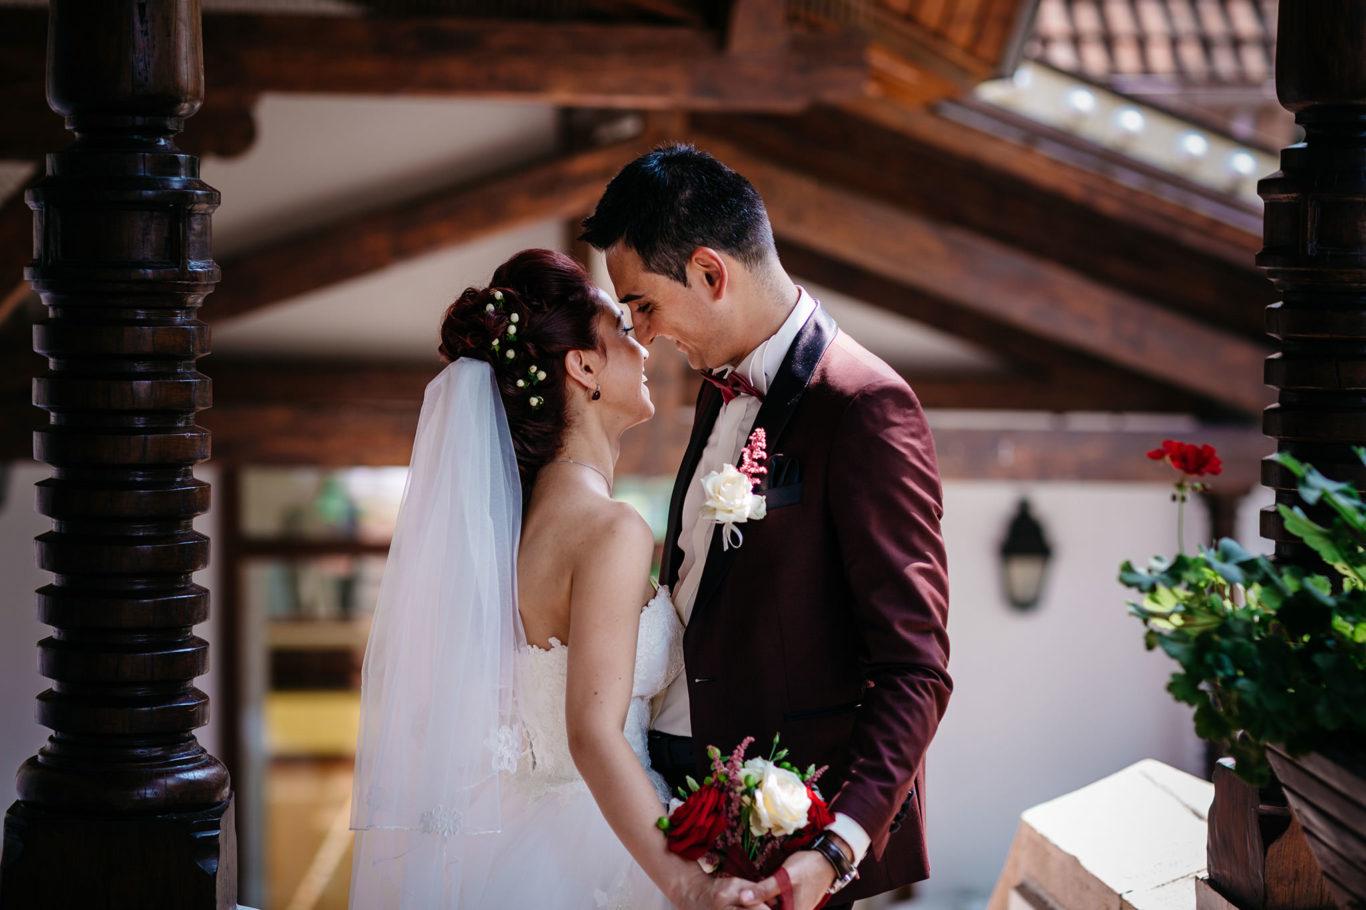 0198-fotografie-nunta-bucuresti-cristina-nicusor-fotograf-ciprian-dumitrescu-cd2_1144